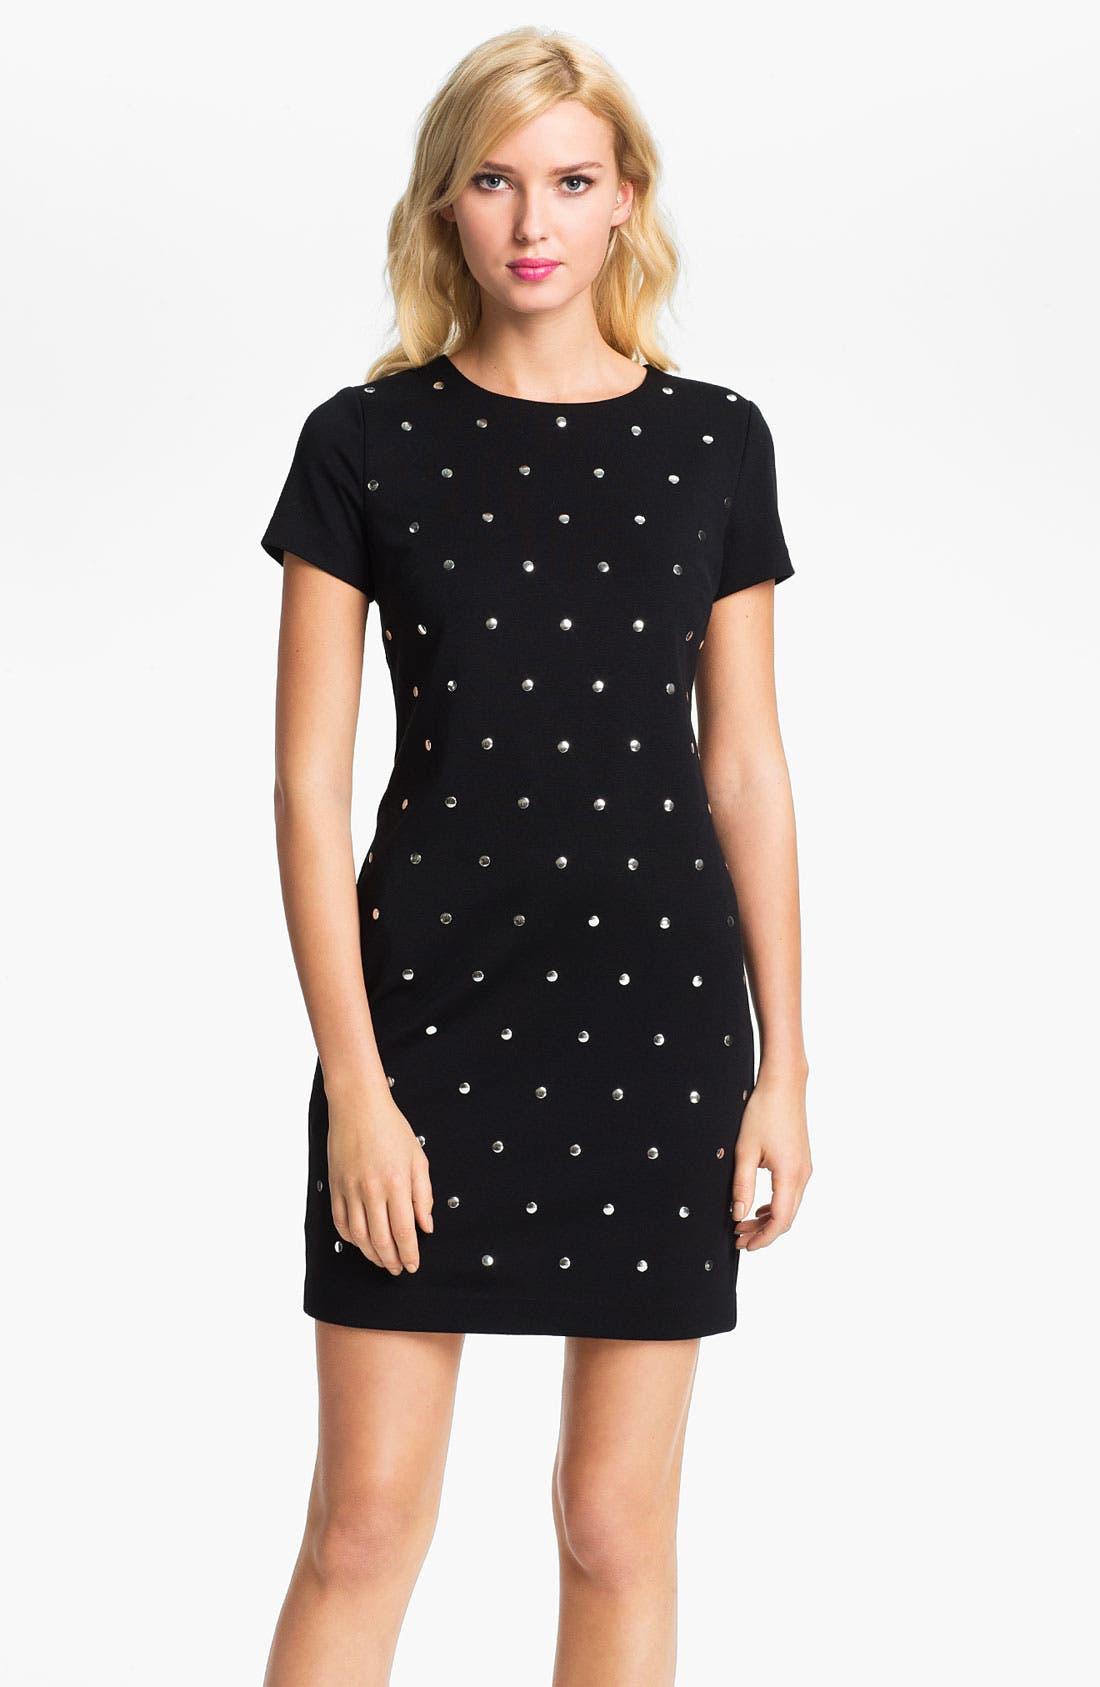 Alternate Image 1 Selected - MICHAEL Michael Kors Studded Short Sleeve Dress